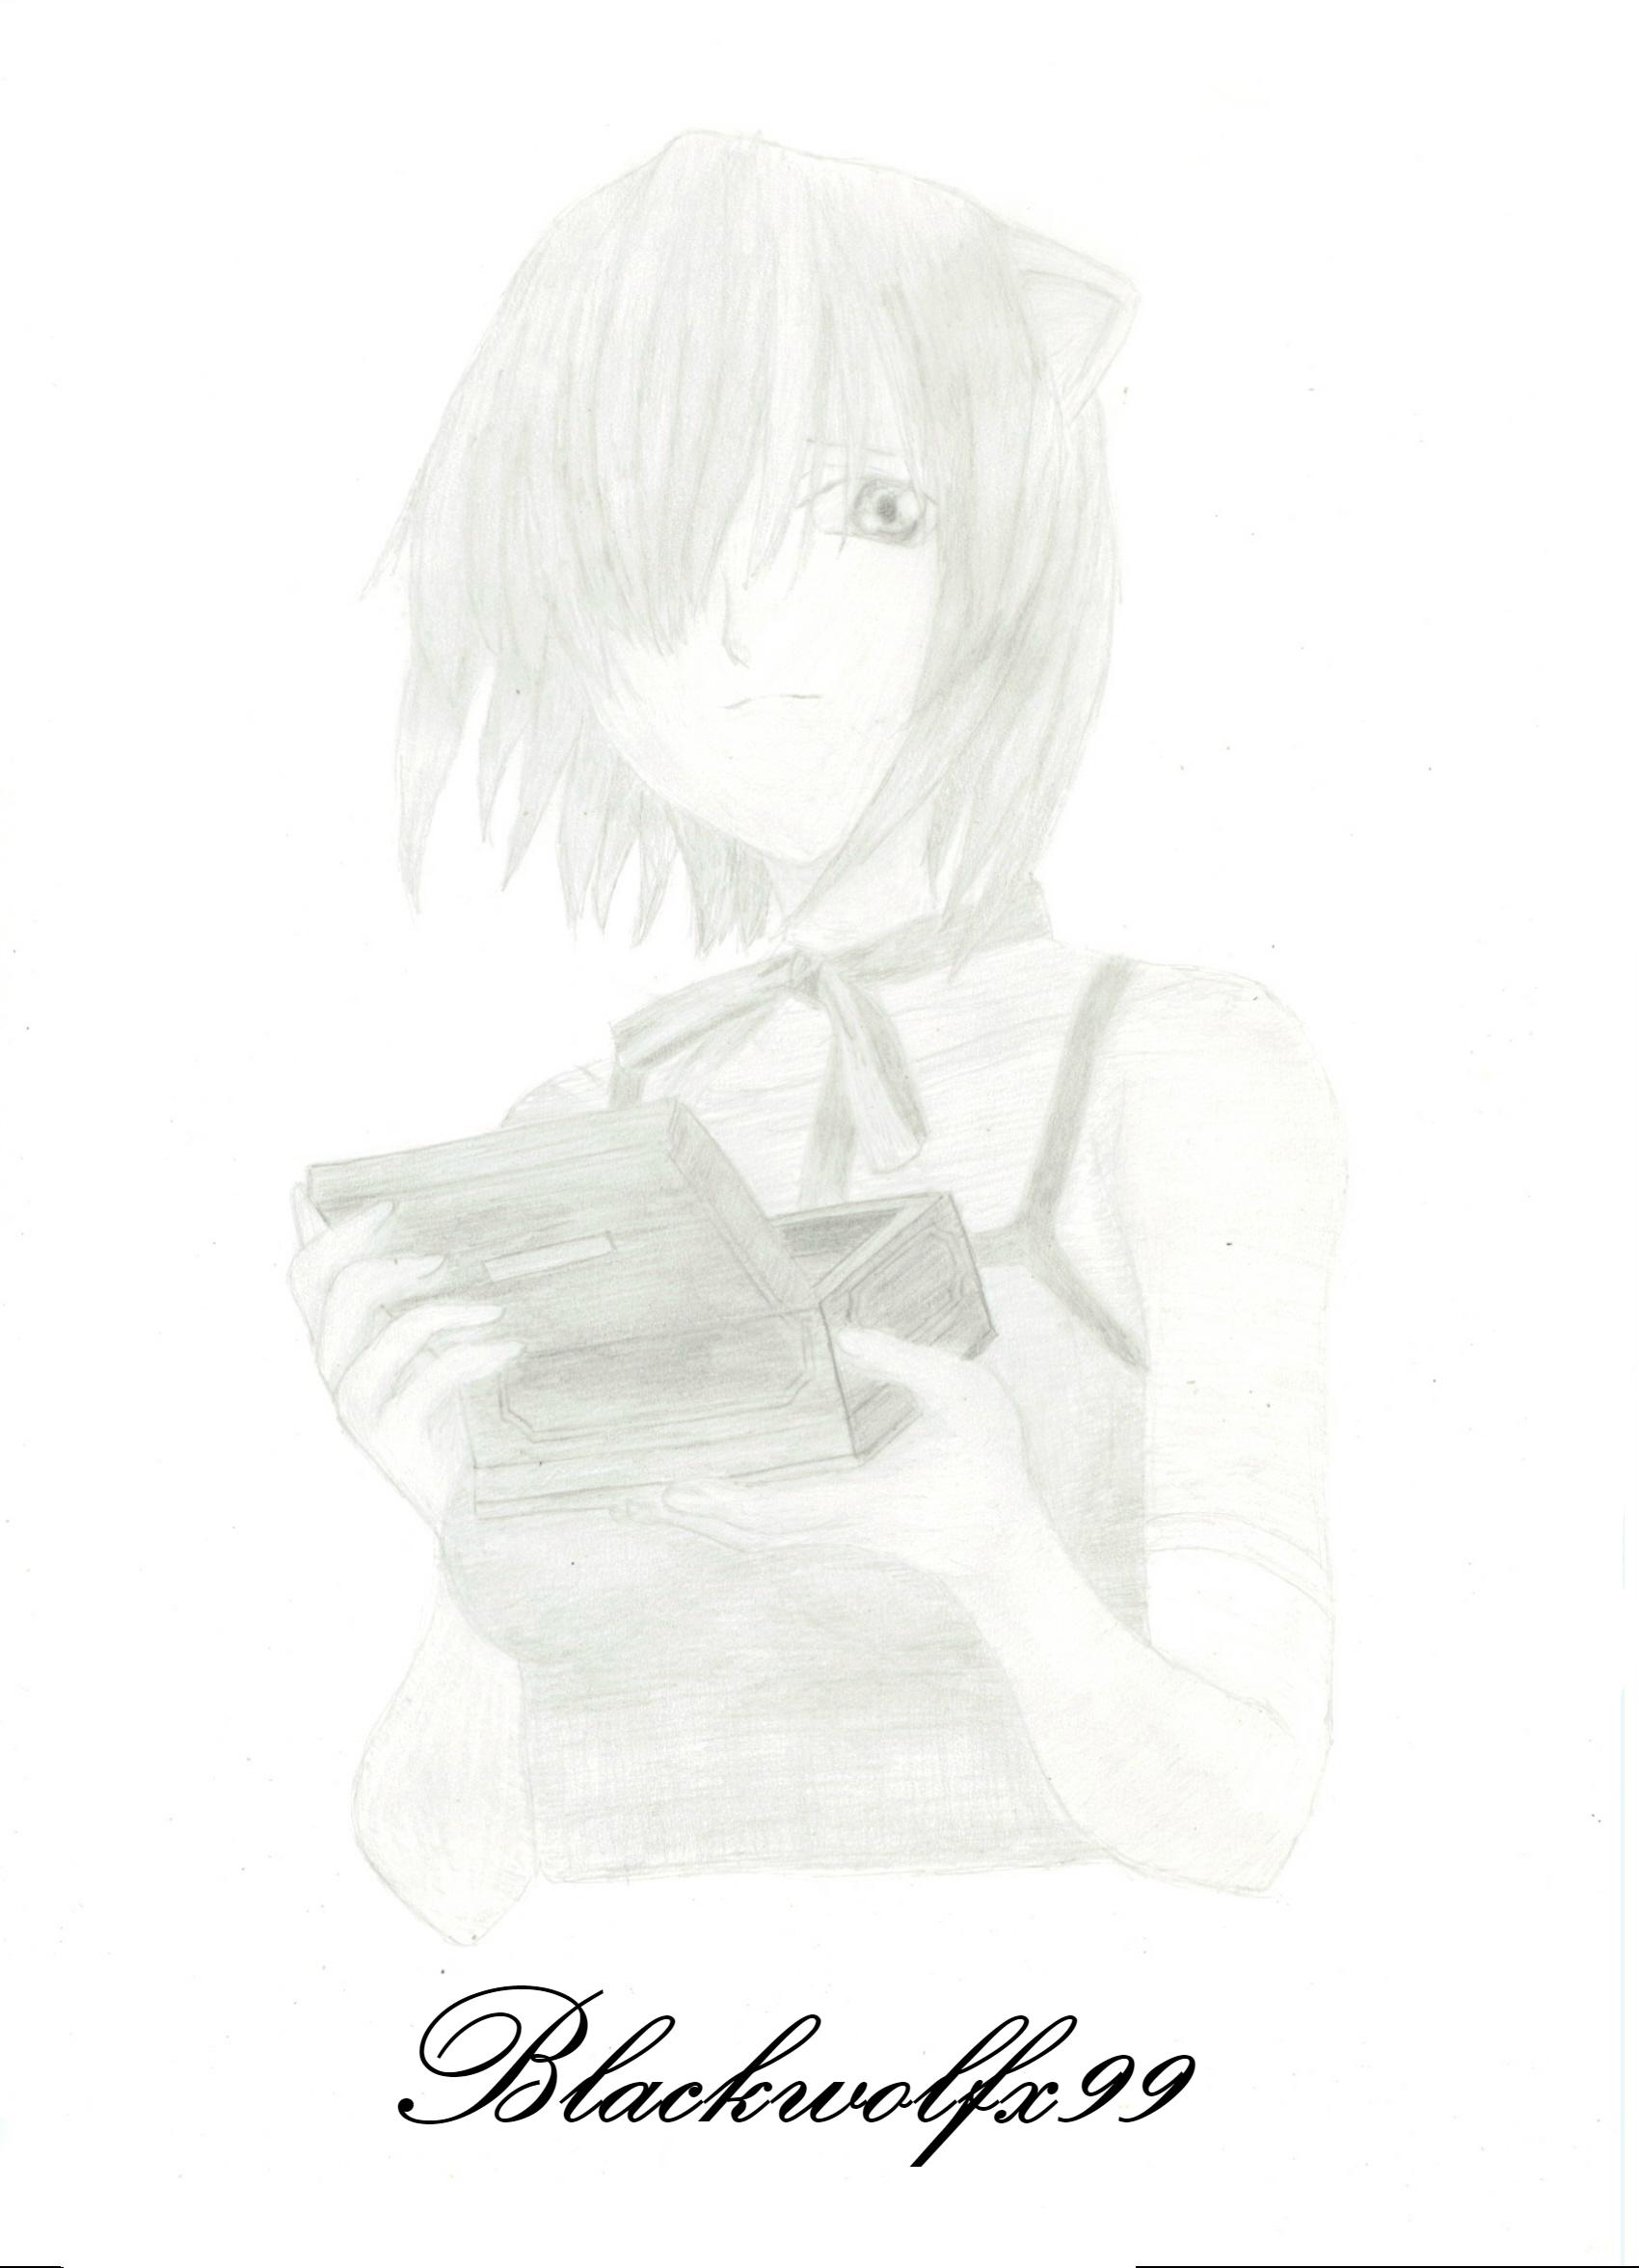 Lucy from Elfen Lied (Blackwolfx99)